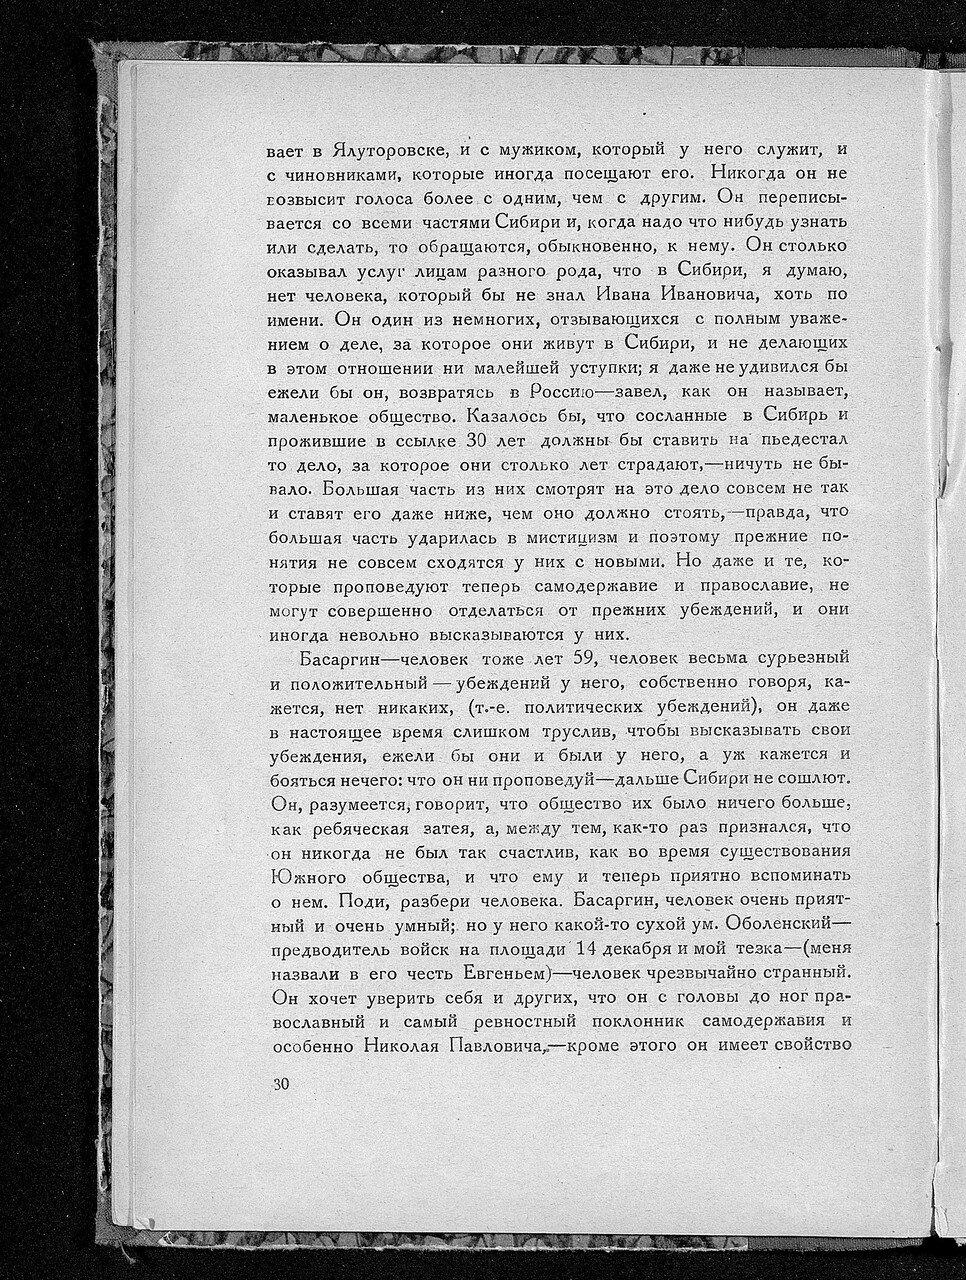 https://img-fotki.yandex.ru/get/893904/199368979.a0/0_214318_40f01804_XXXL.jpg